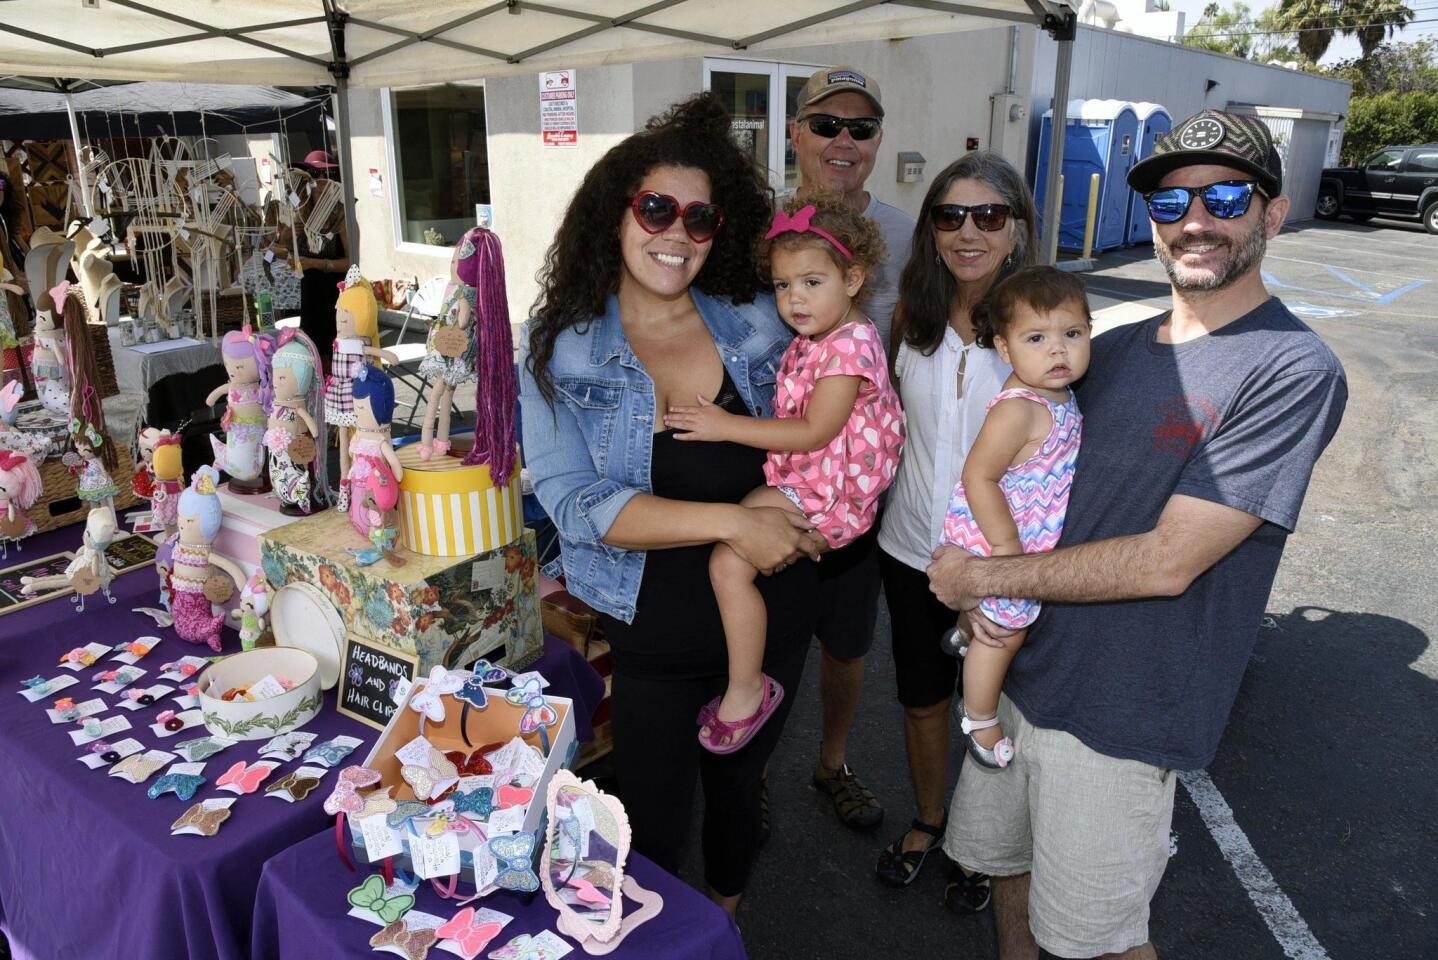 Dollmaker Helen Jaeger with Emelia, Grandparents Bruce and Denise Jaeger, James Jaeger with Madeline